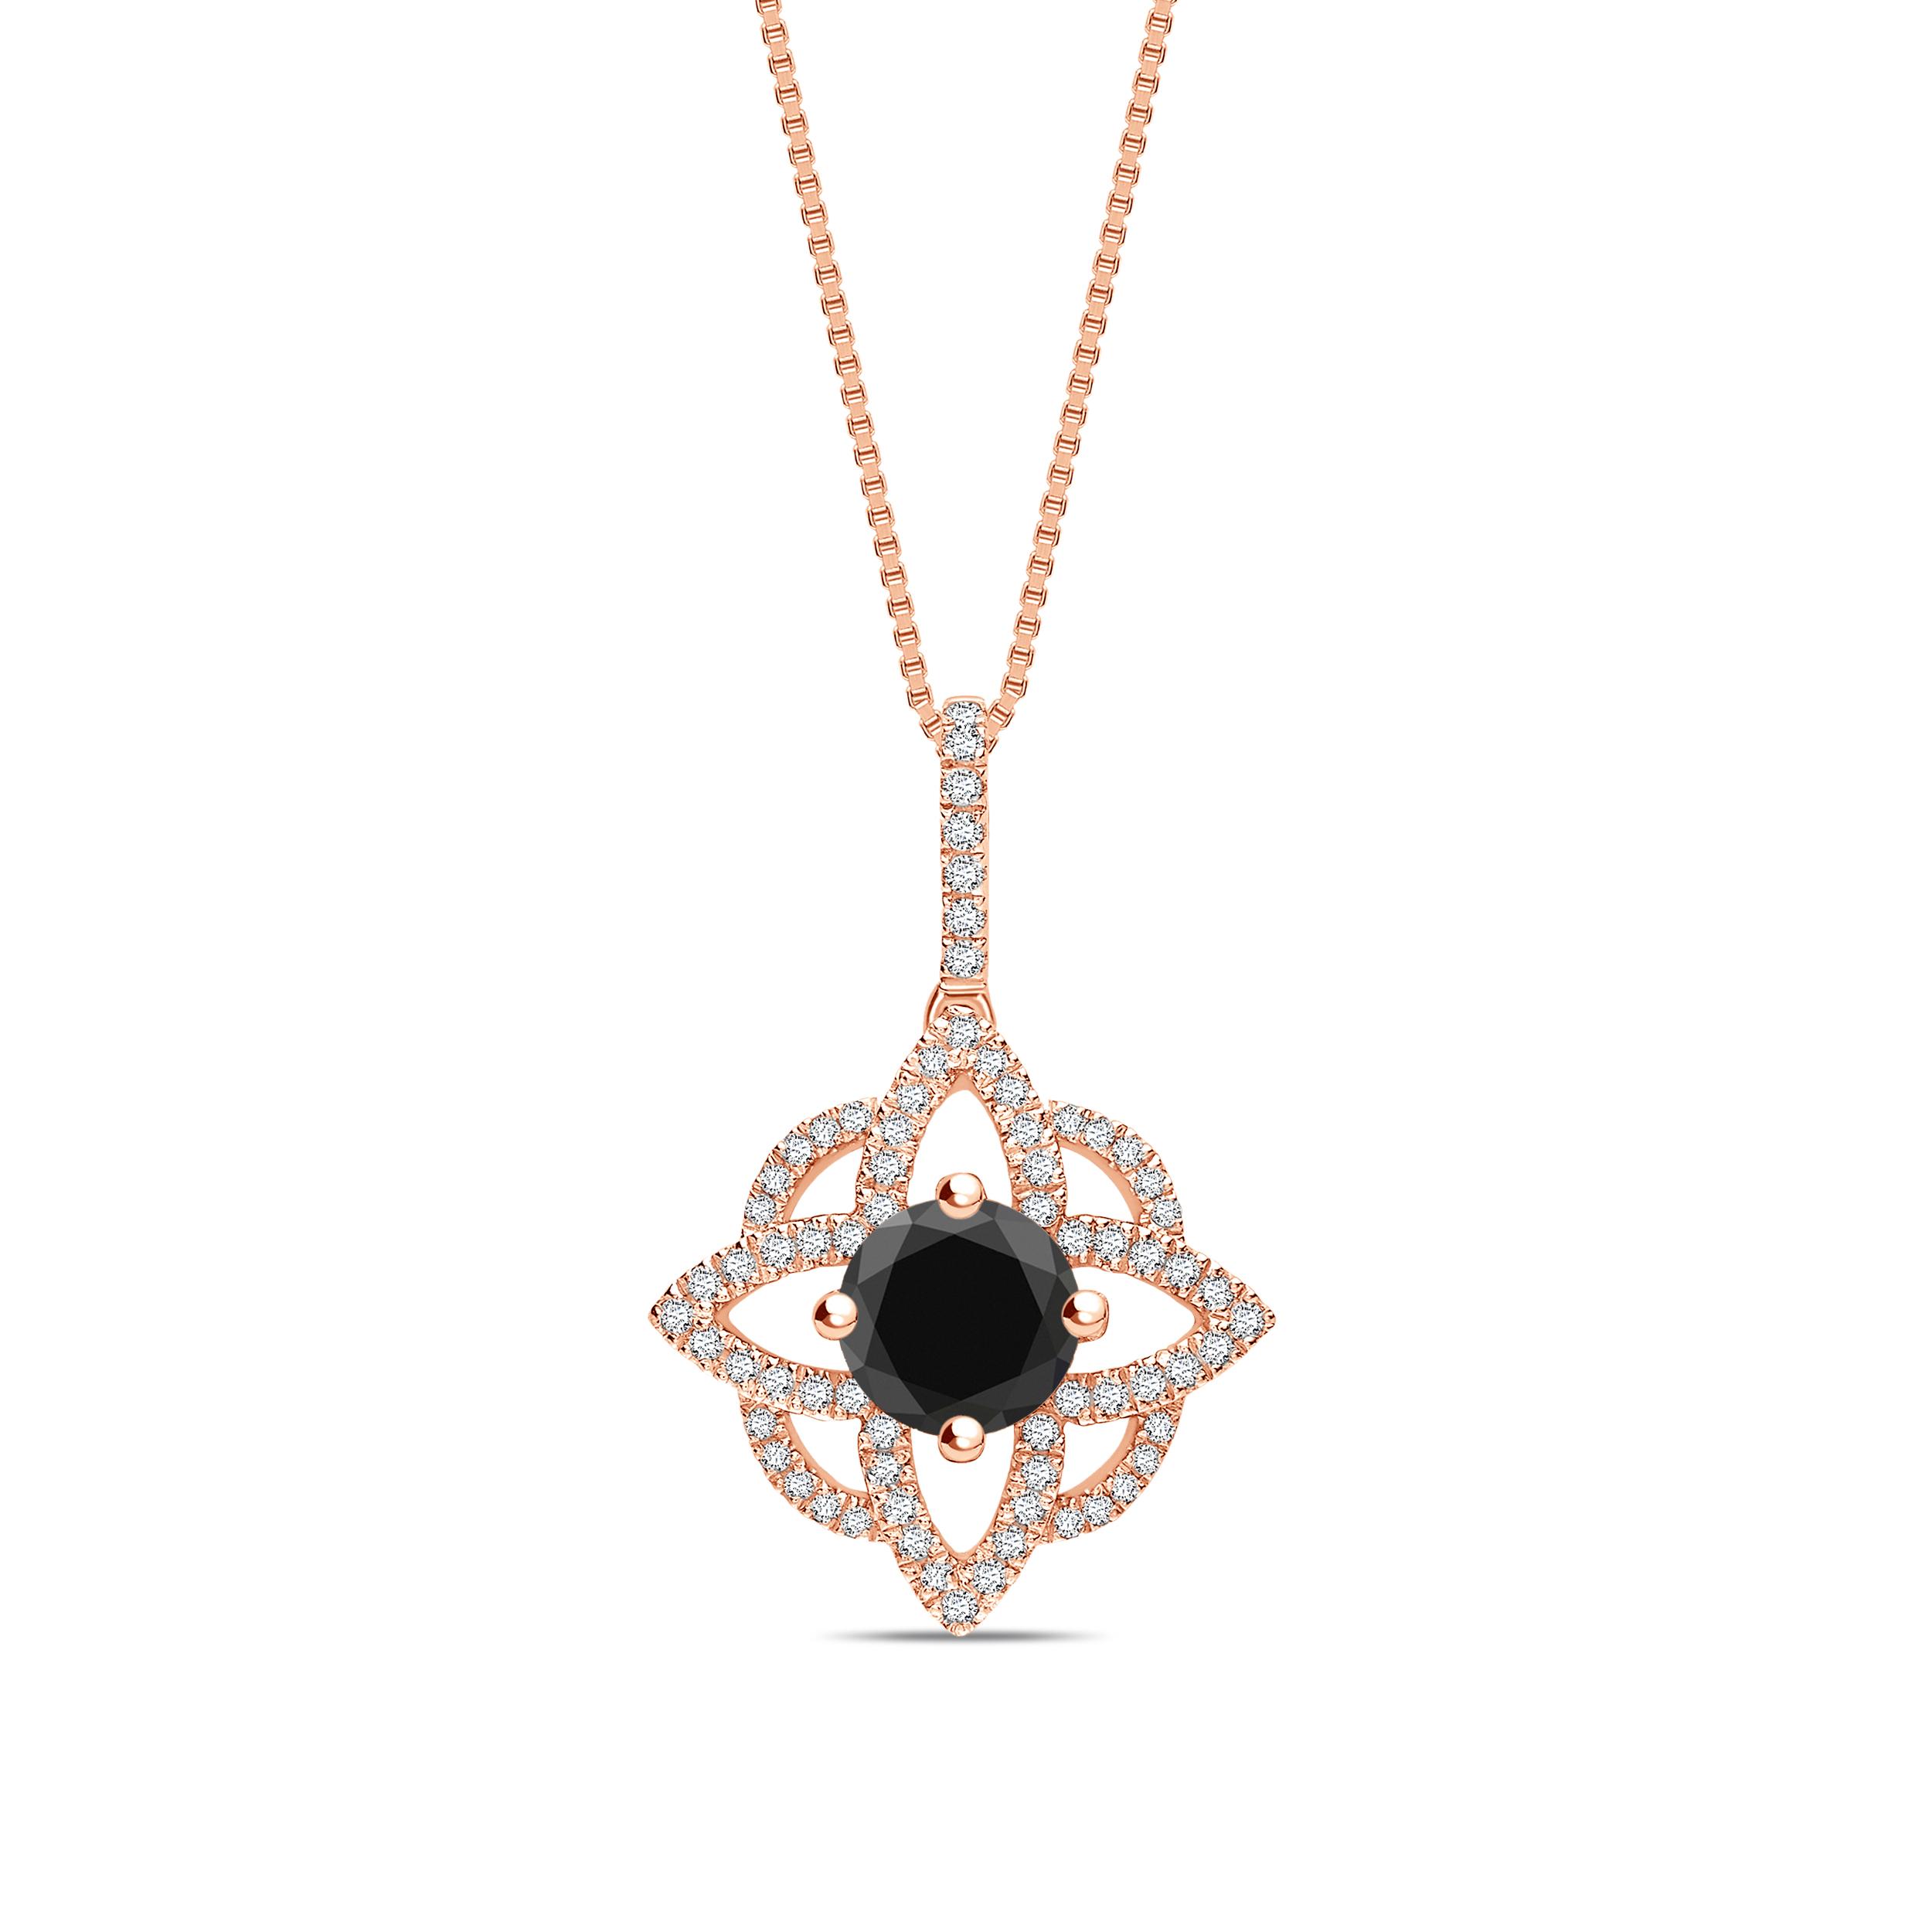 Round Cut Designer Diamond Solitaire Pendants Necklace in Black Color